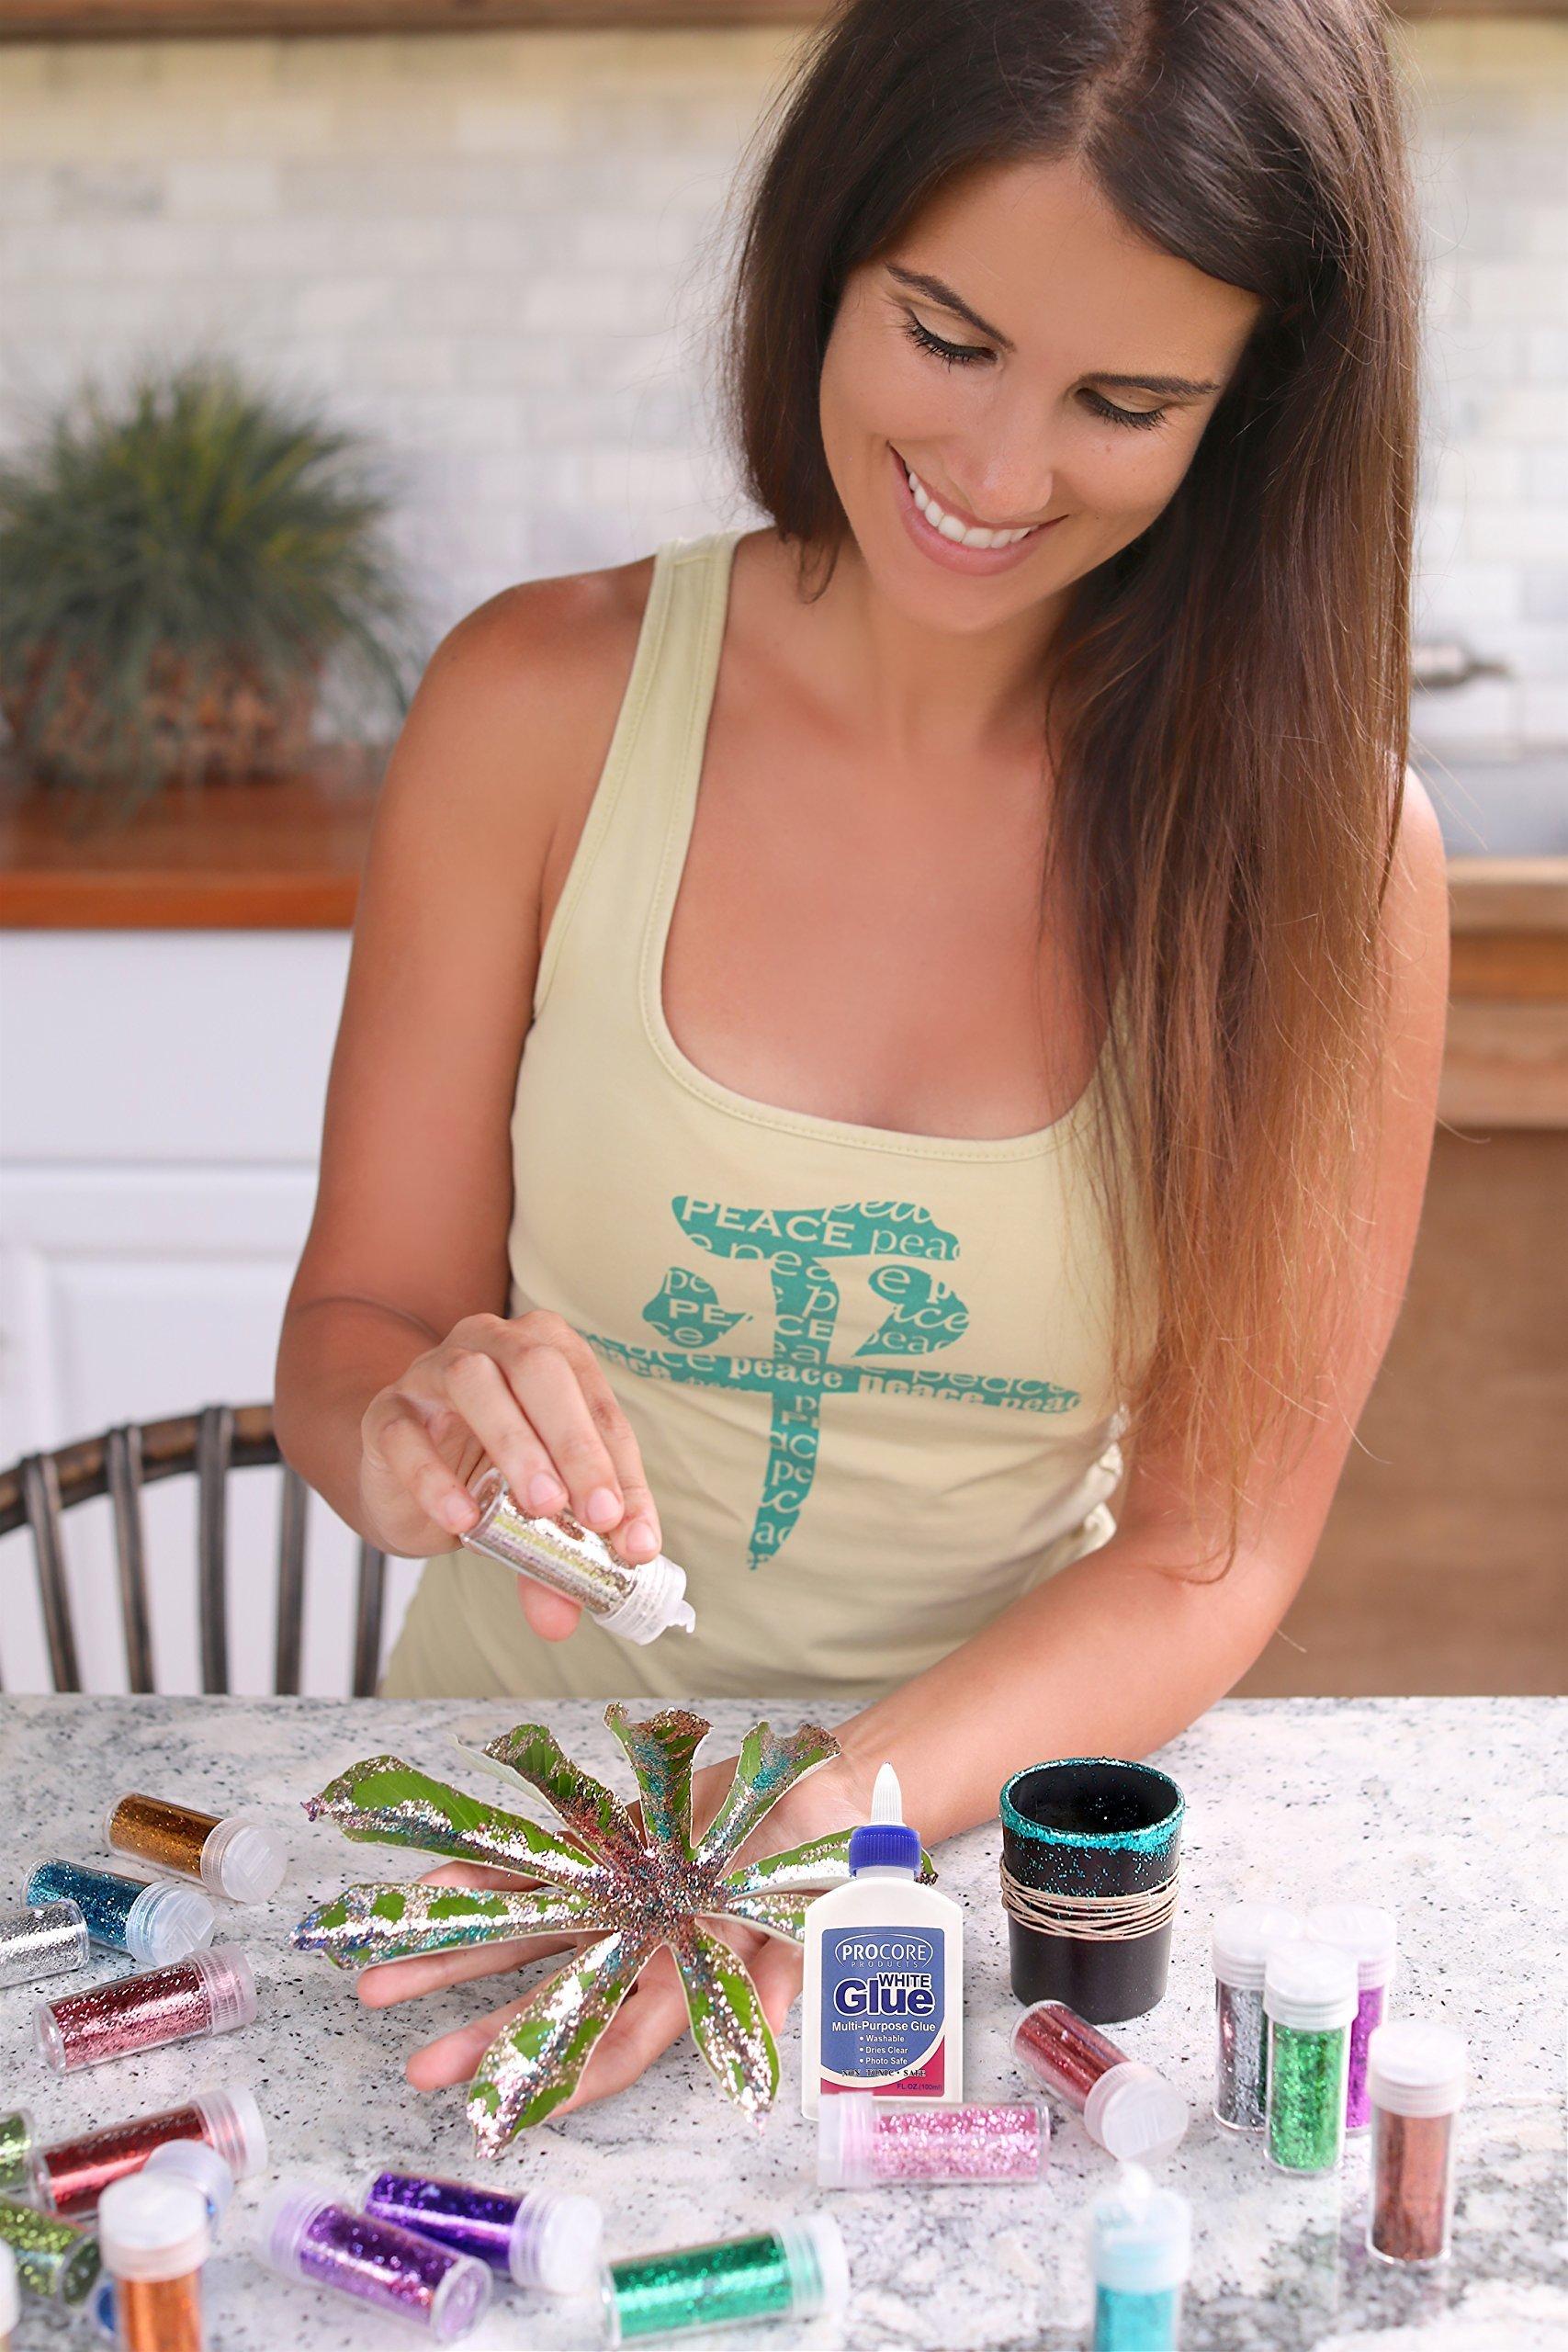 Glitter Shaker 24 Multi Colored Jar Set, Fine For Scrapbooking, Making Slime, Greeting Cards, Great For Holiday Decorations, Bonus Craft Glue Bottle